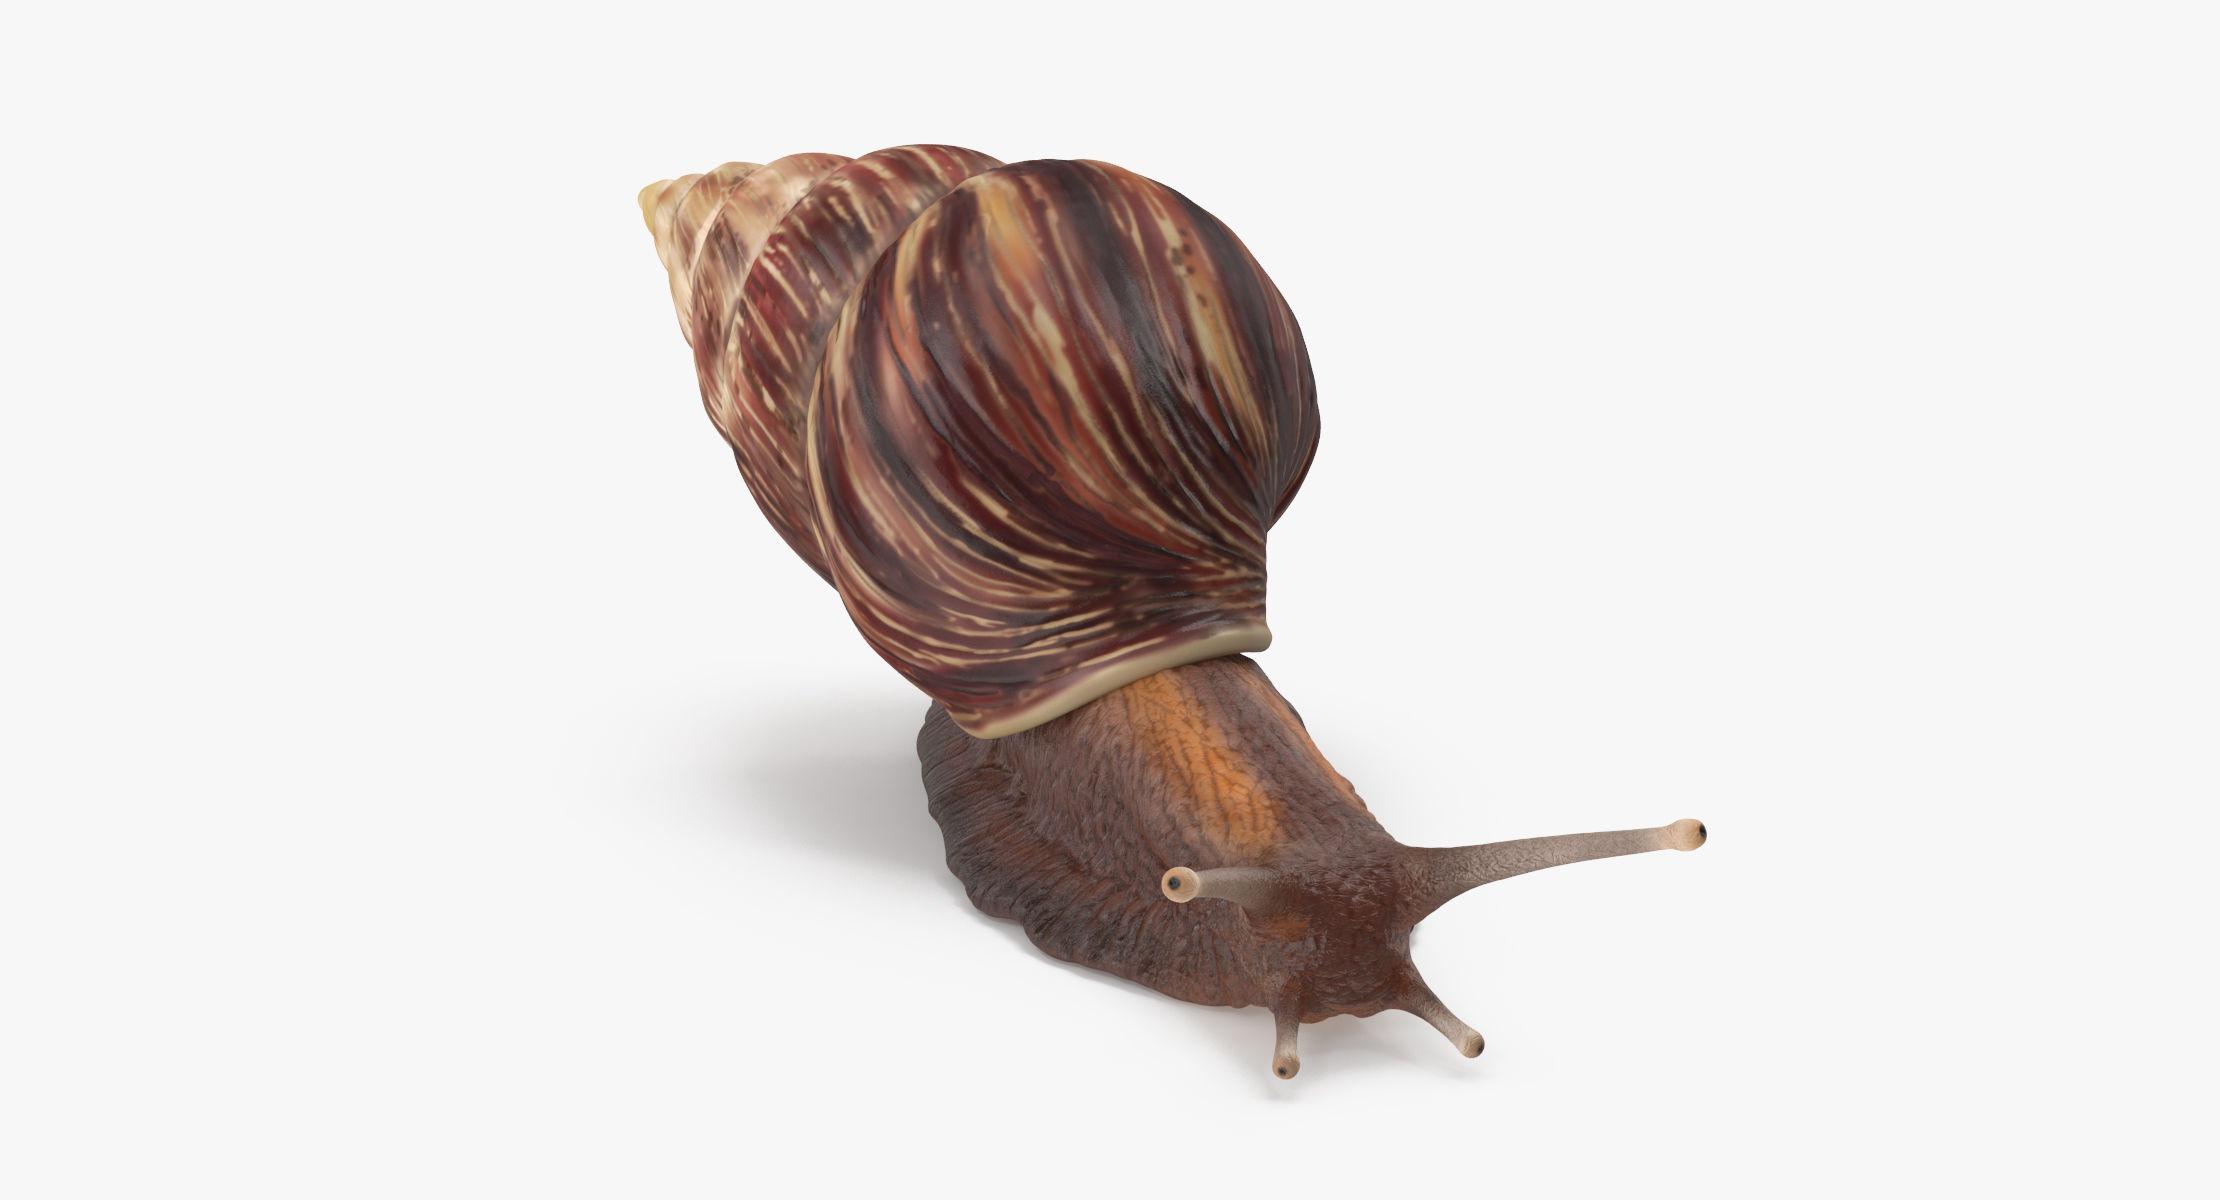 Grove snail 01 - reel 1